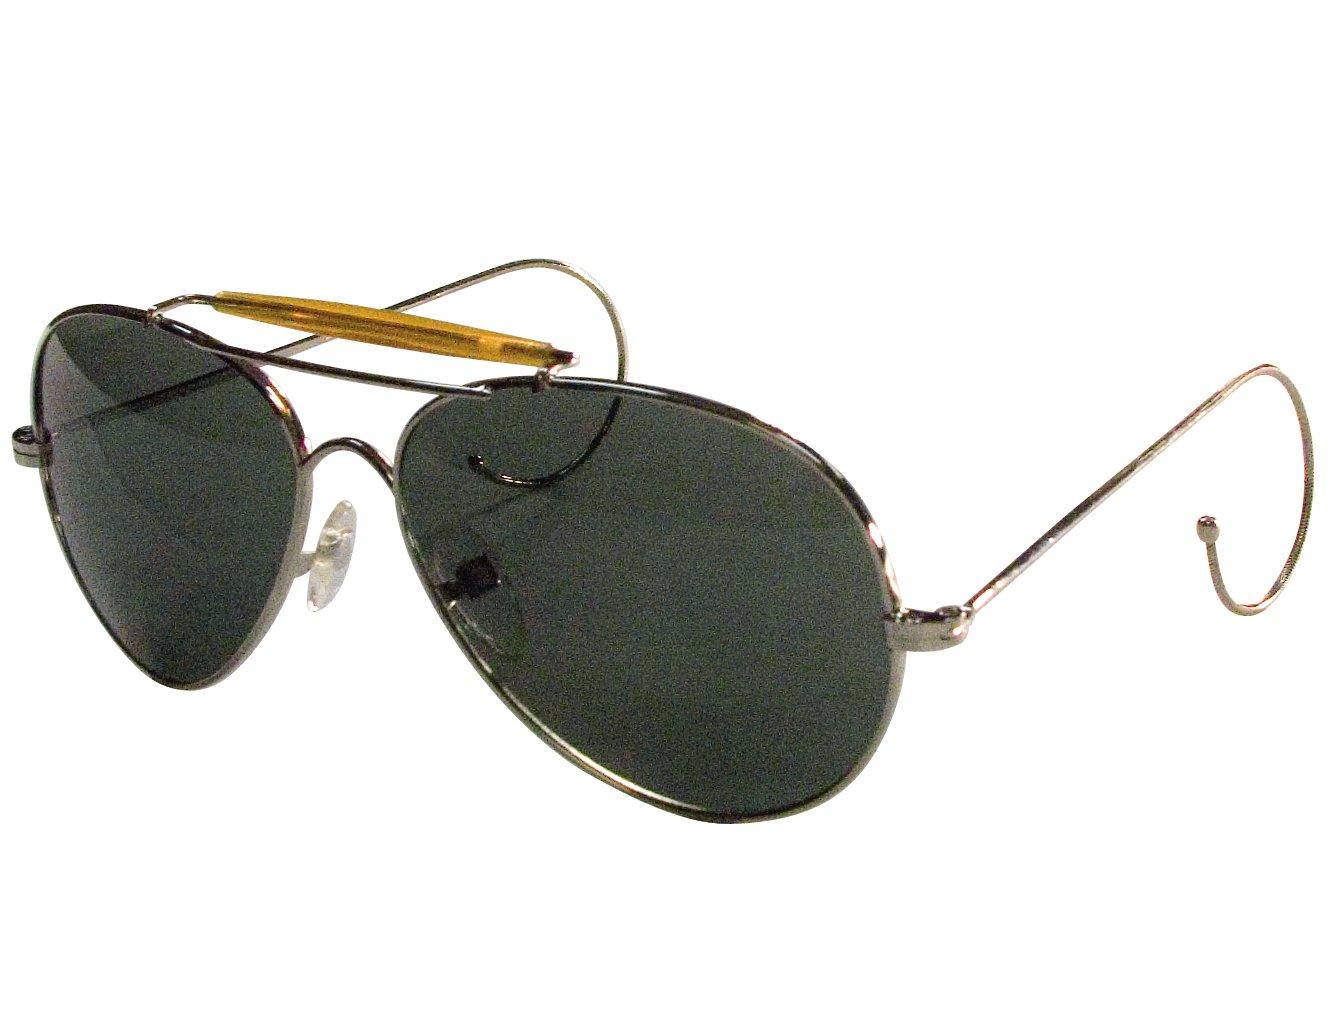 Rothco Aviator Sunglasses, Green by Rothco